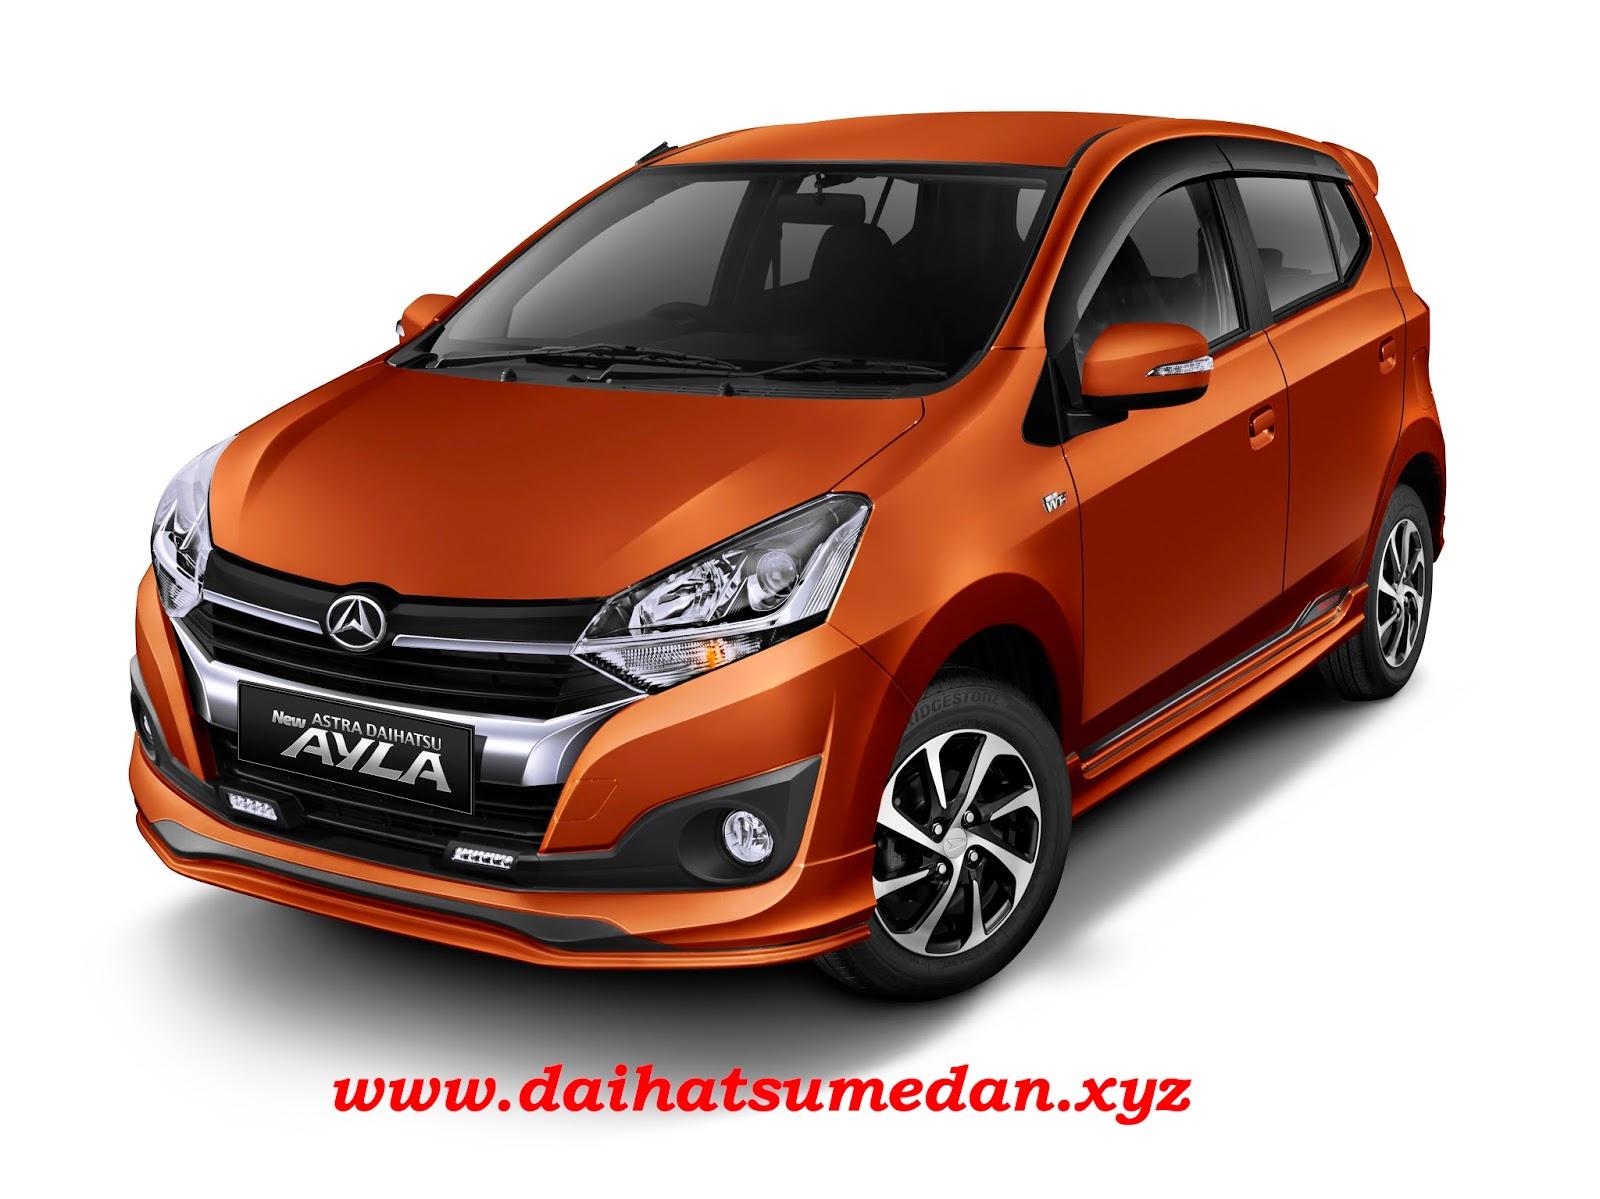 Astra Daihatsu New Ayla